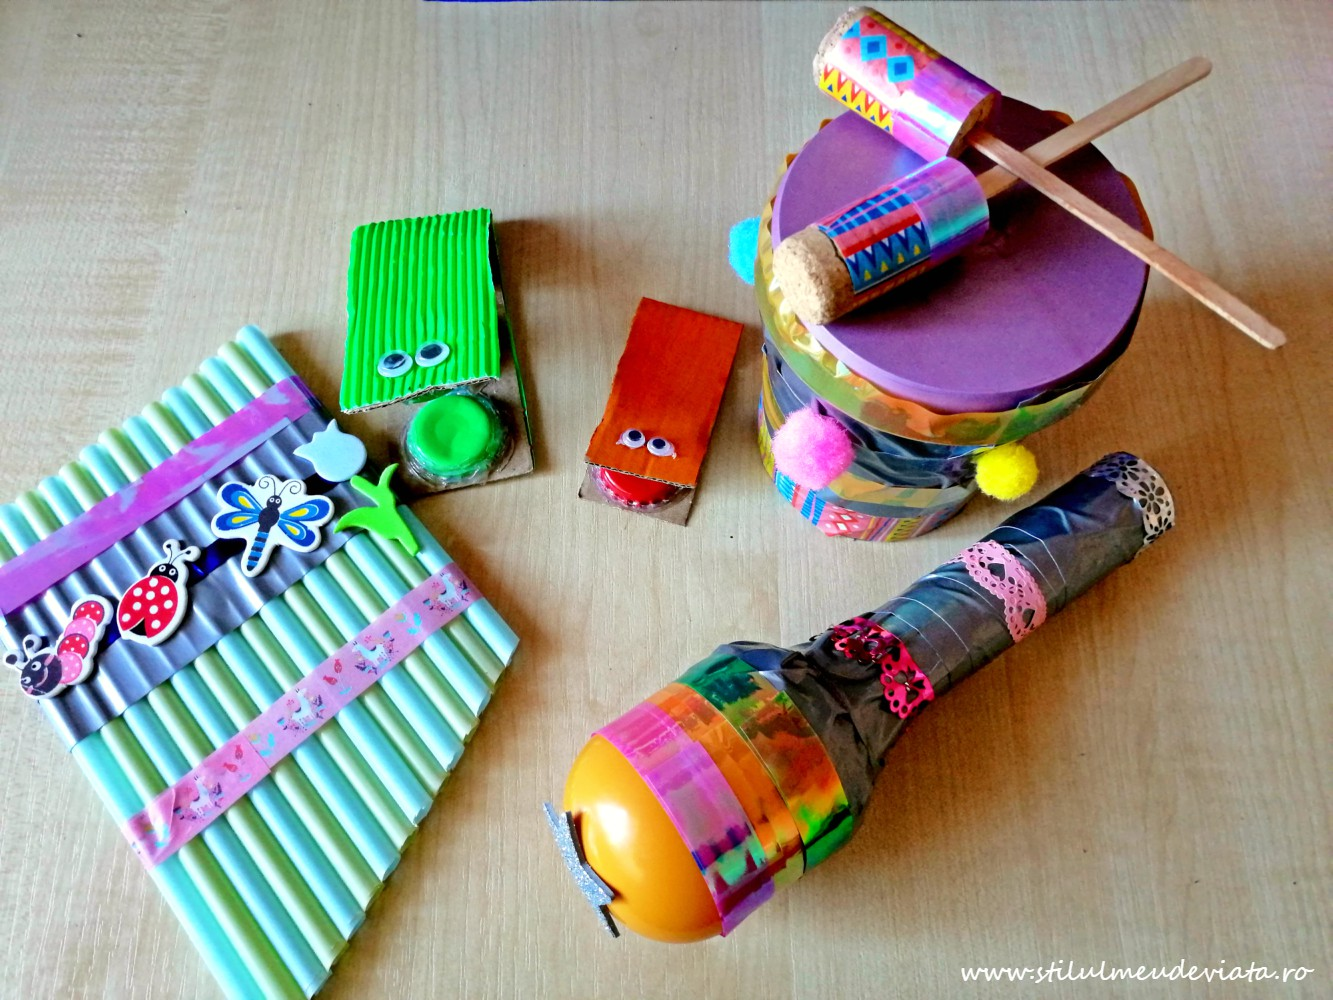 instrumente muzicale din materiale reciclate